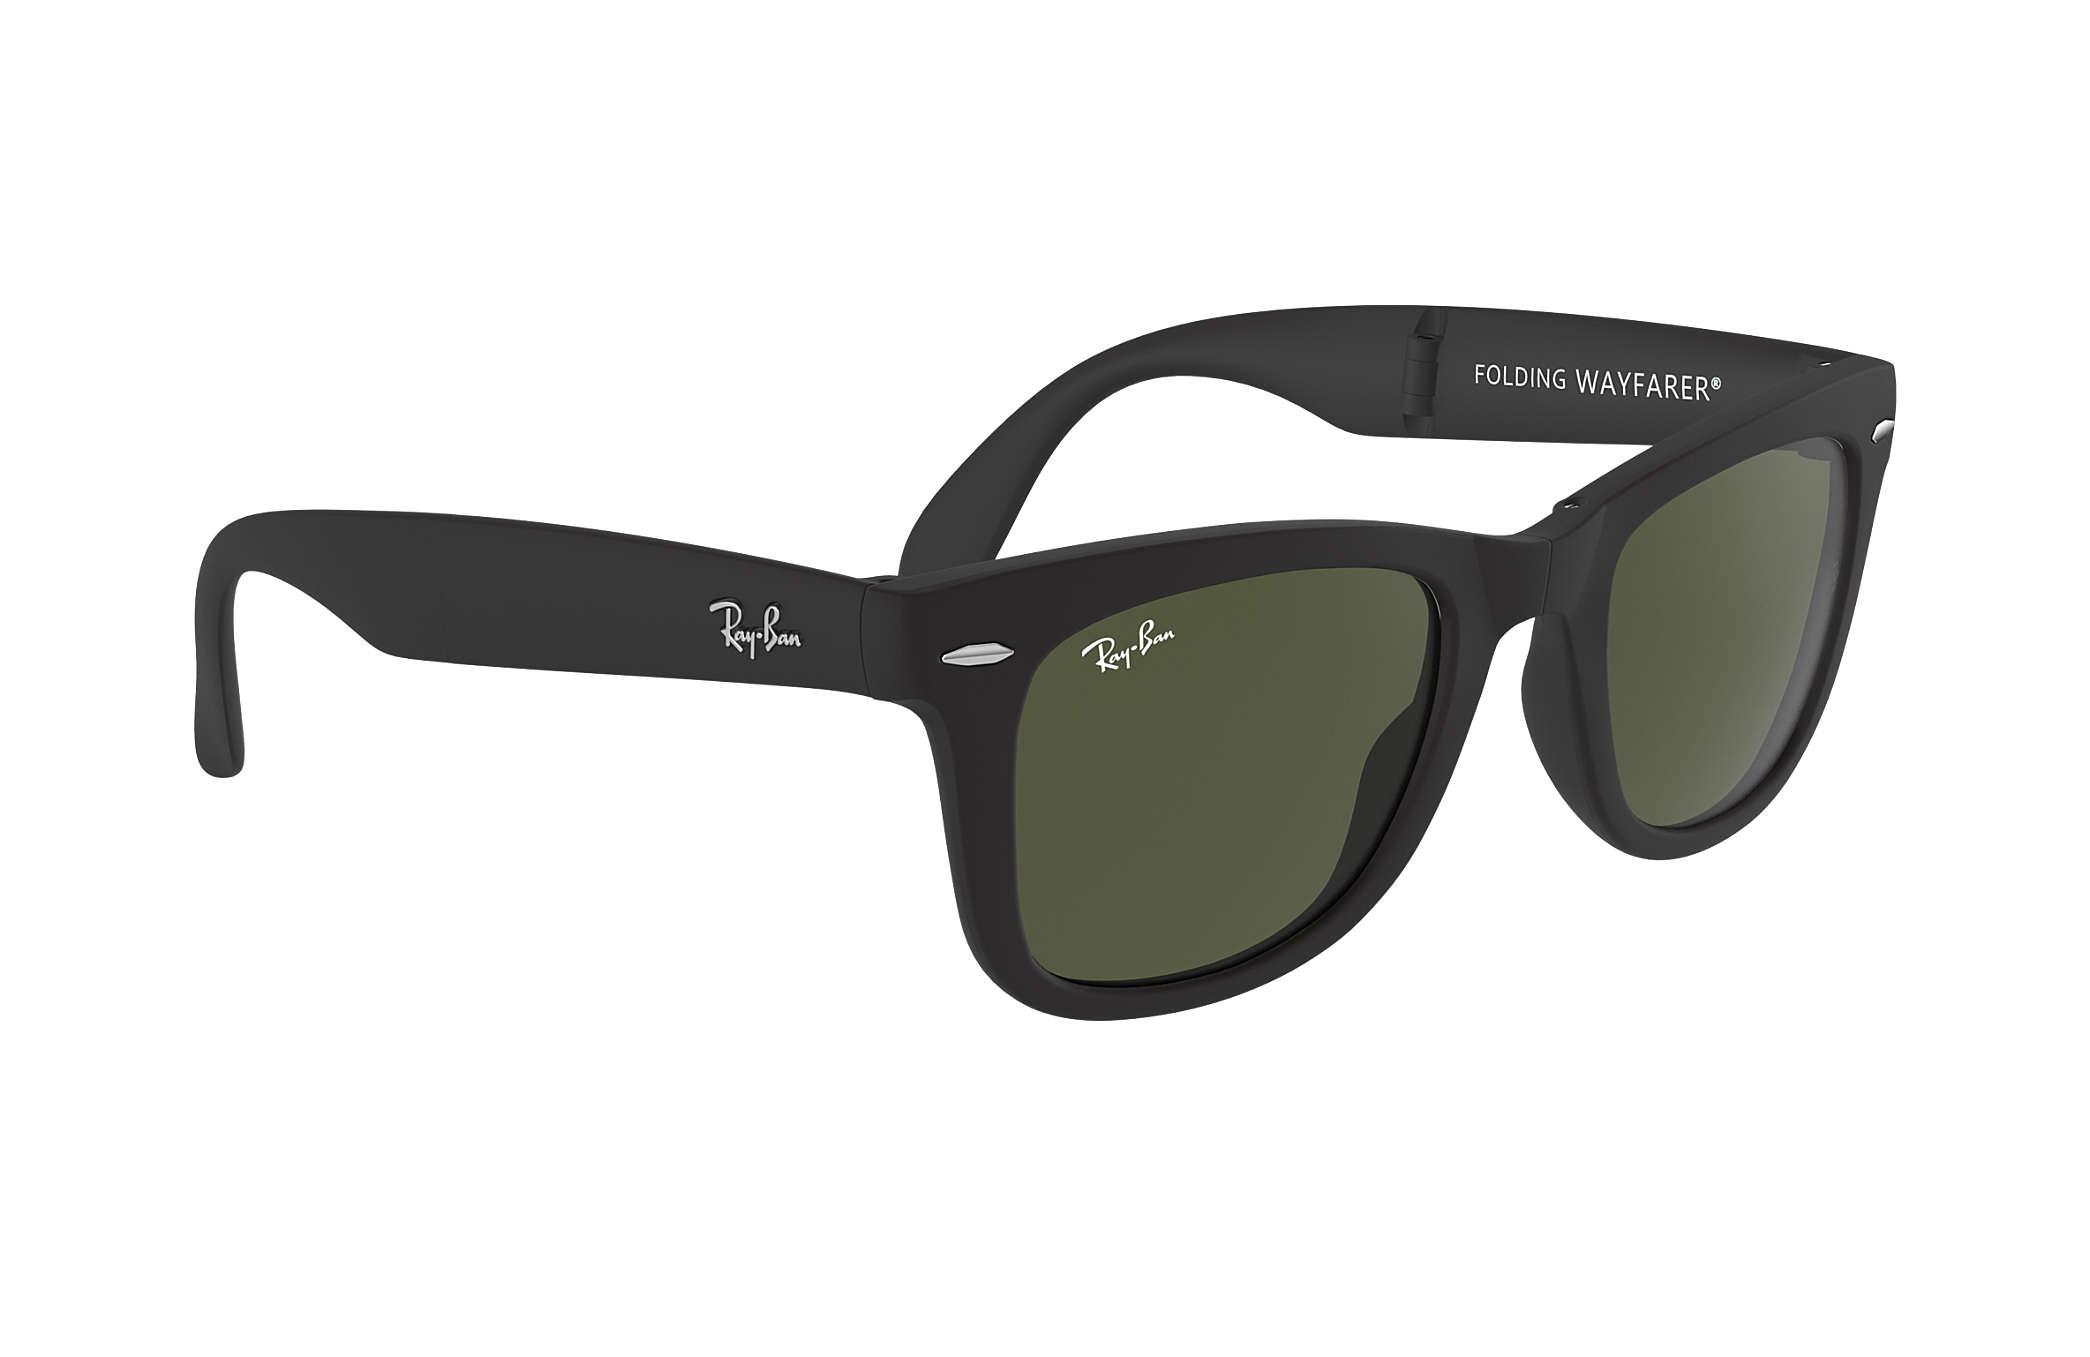 80811c0845 Ray-Ban Wayfarer Folding Classic RB4105 Black - Nylon - Green Lenses ...